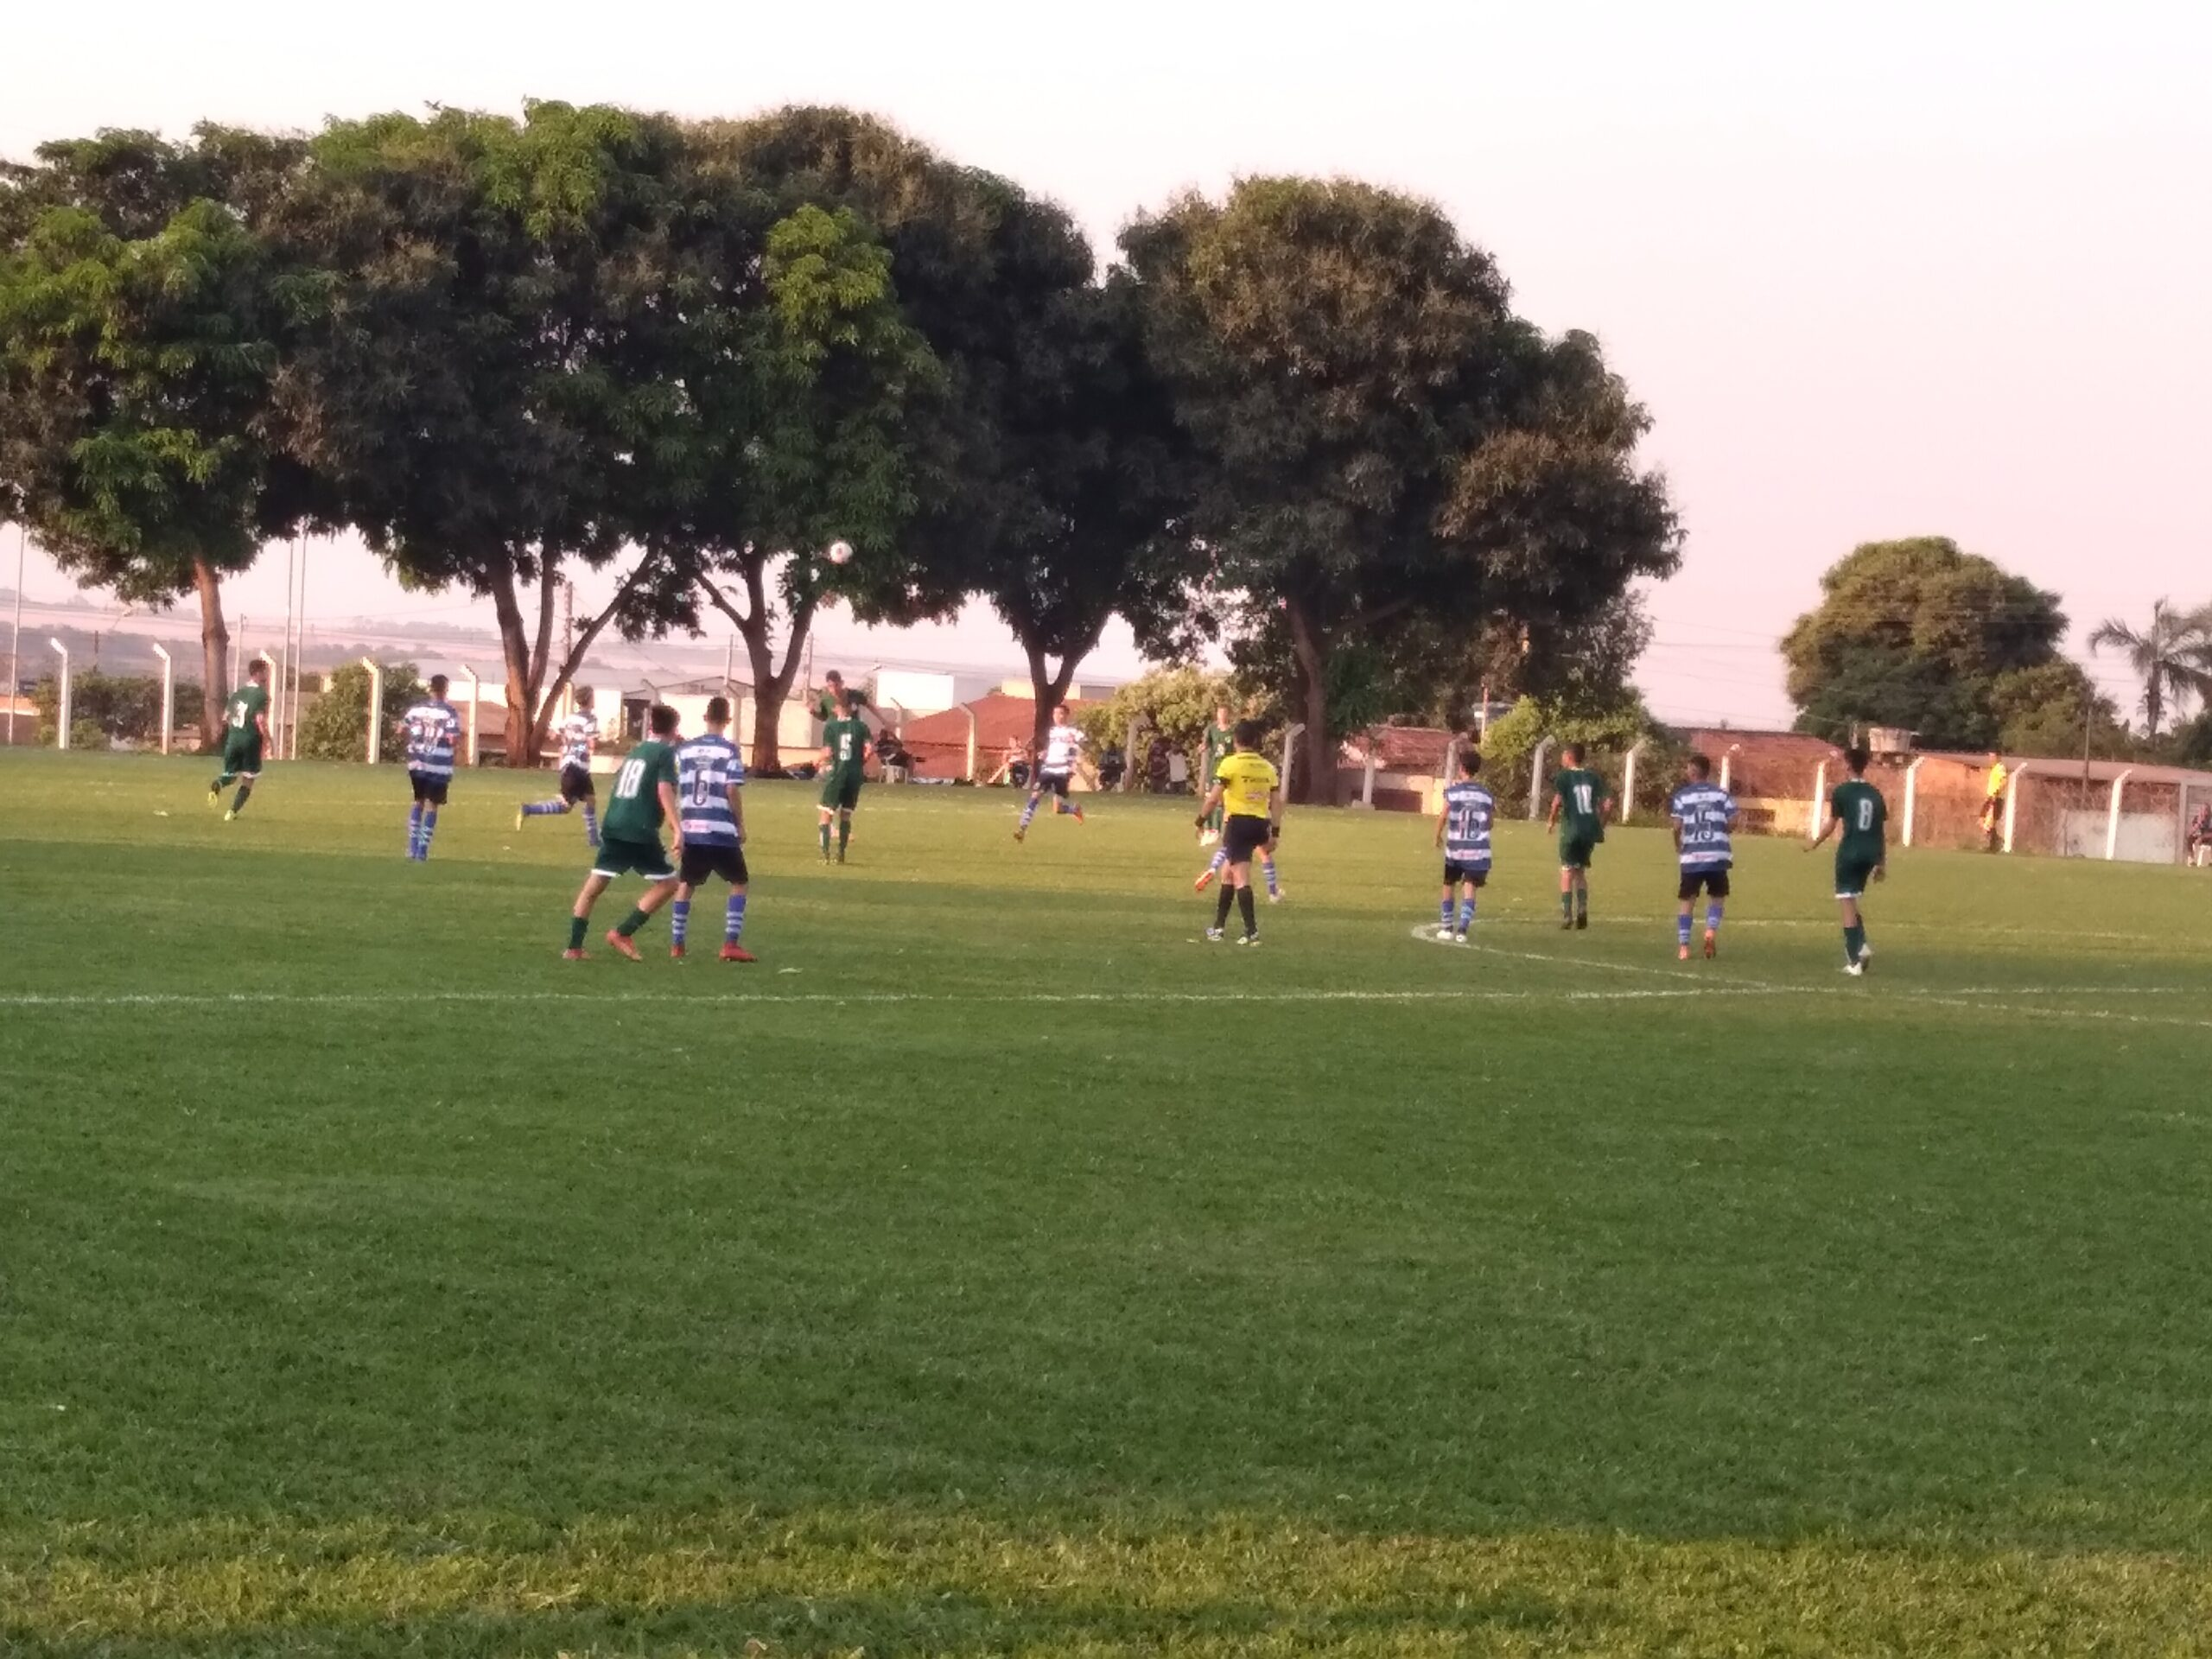 Independente perde para o Goiás no Campeonato Goiano Sub-15